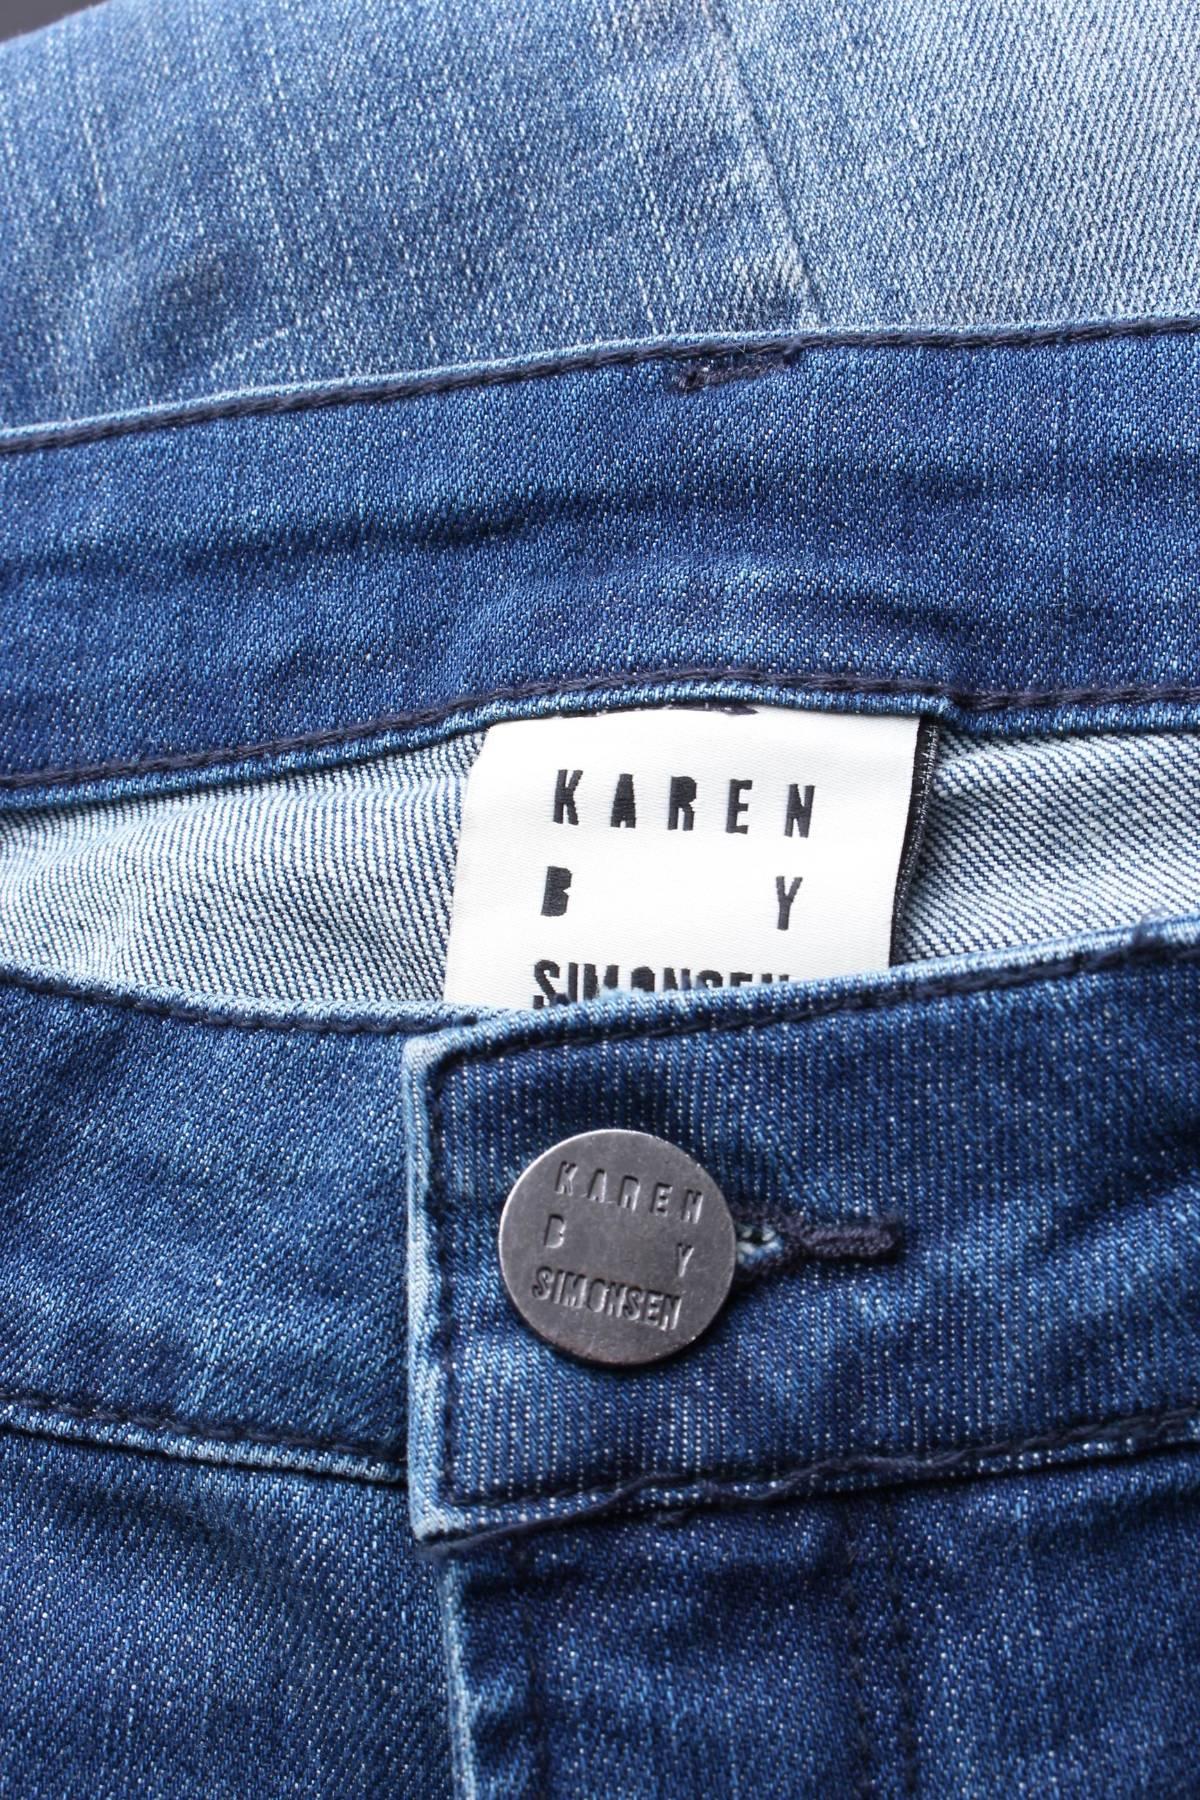 Дамски дънки Karen by Simonsen3